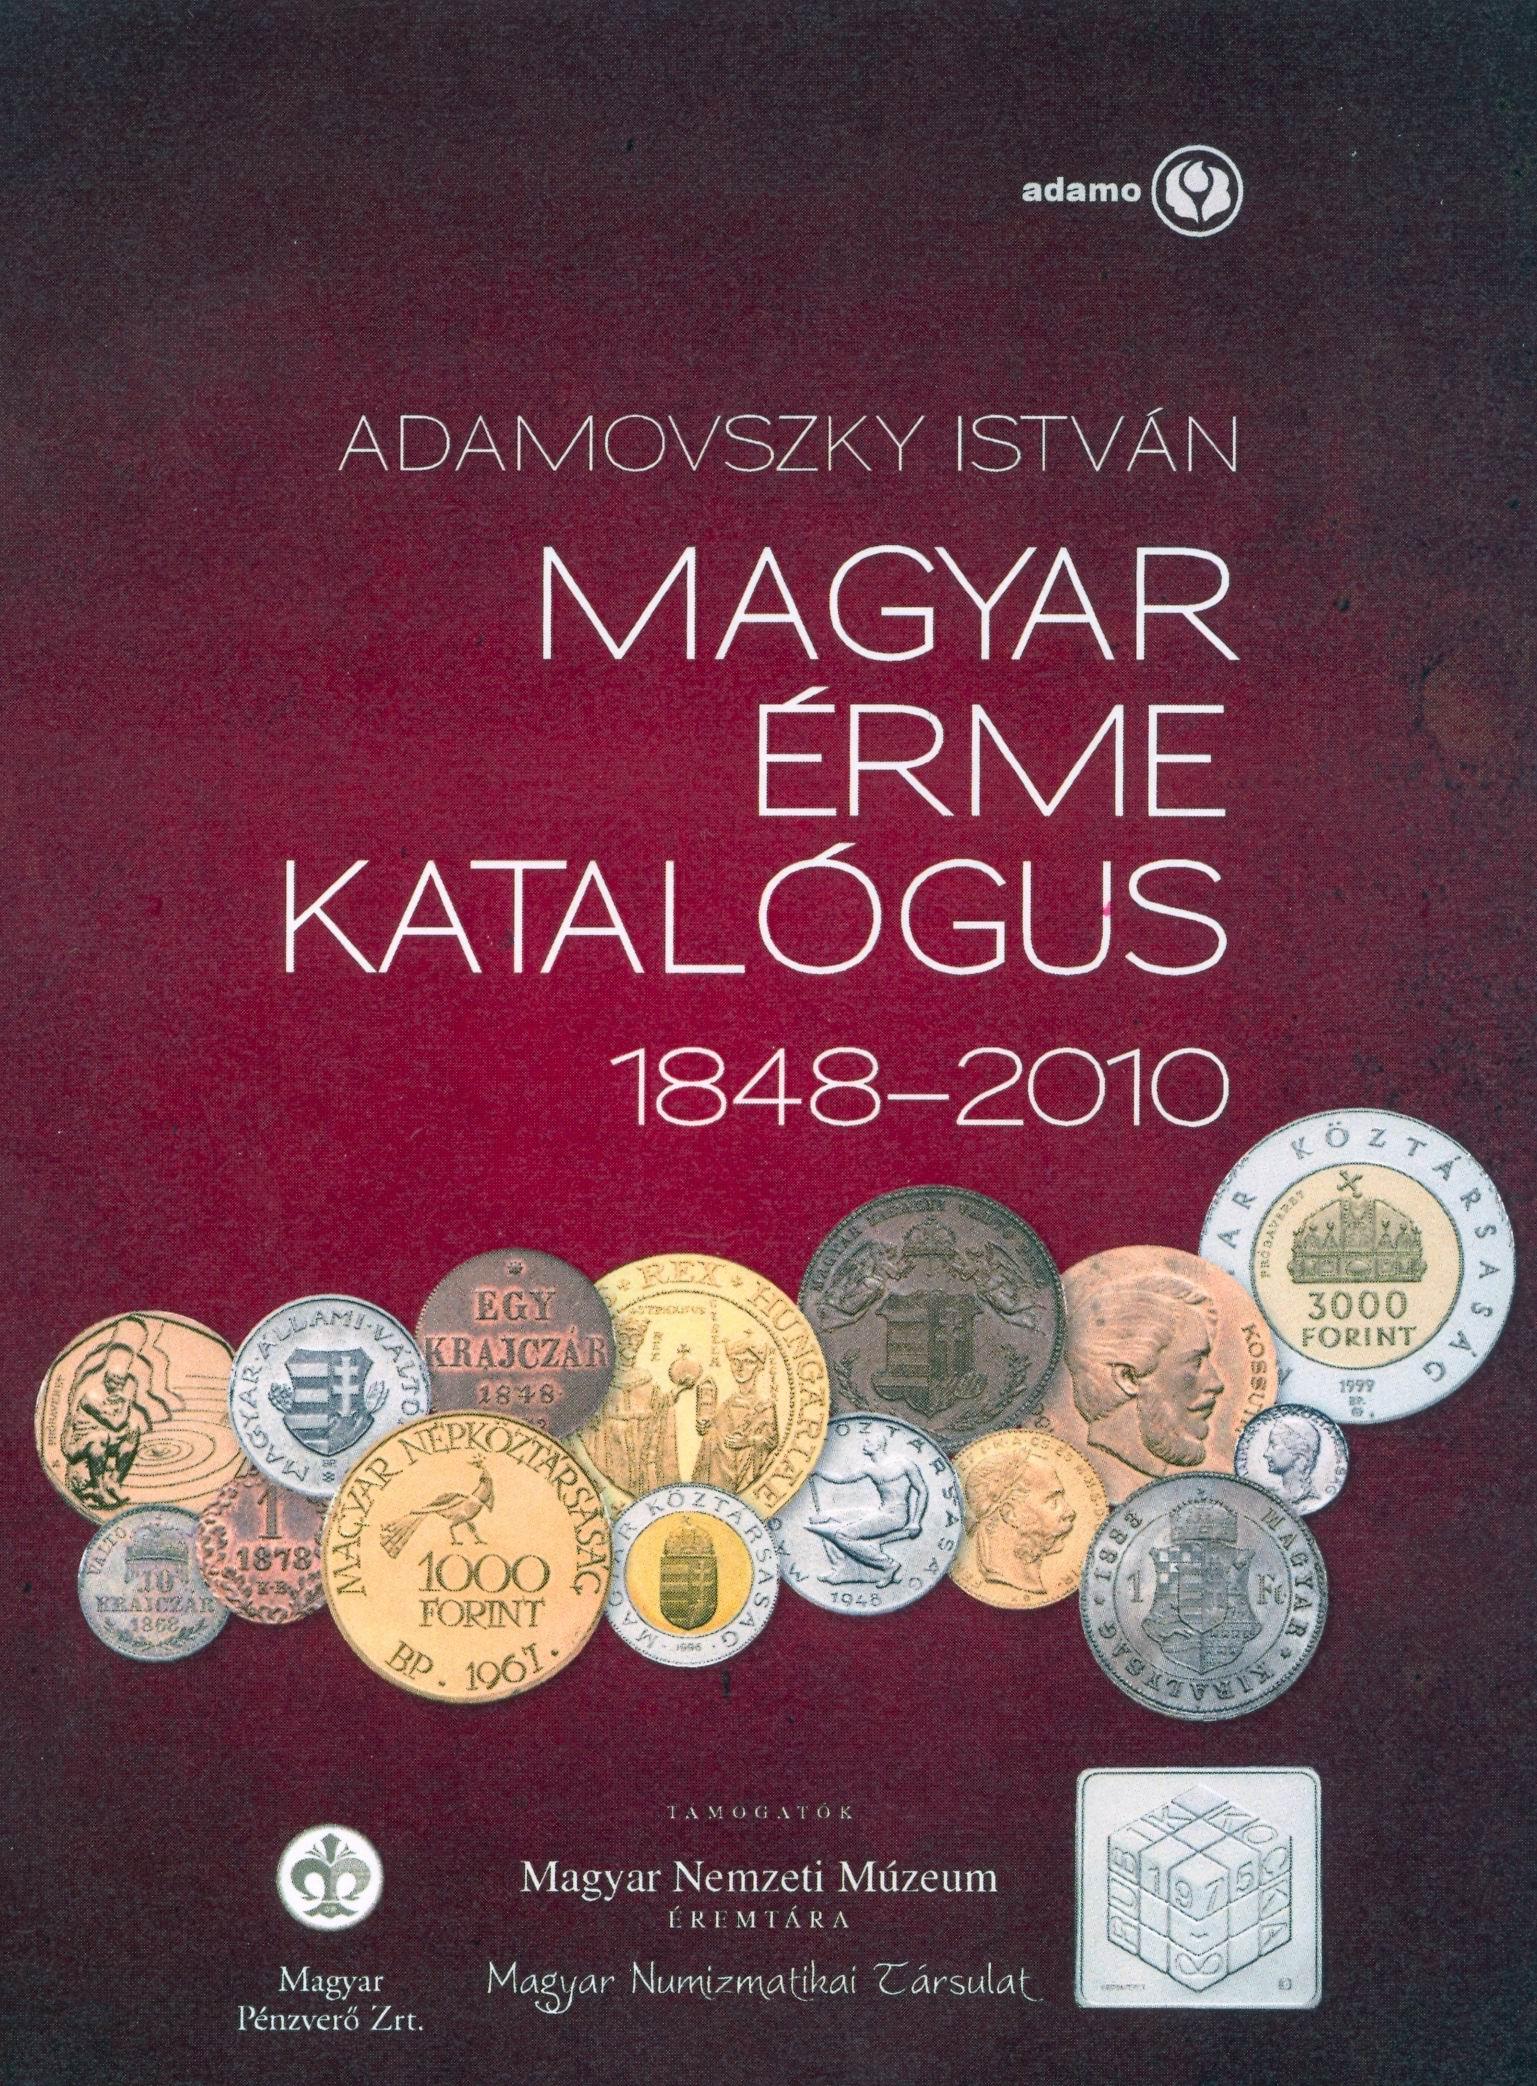 http://www.hamispenzek.hu/konyvek/adamovszky_magyar_erme_katalogus_1848-2010_nagy.jpg